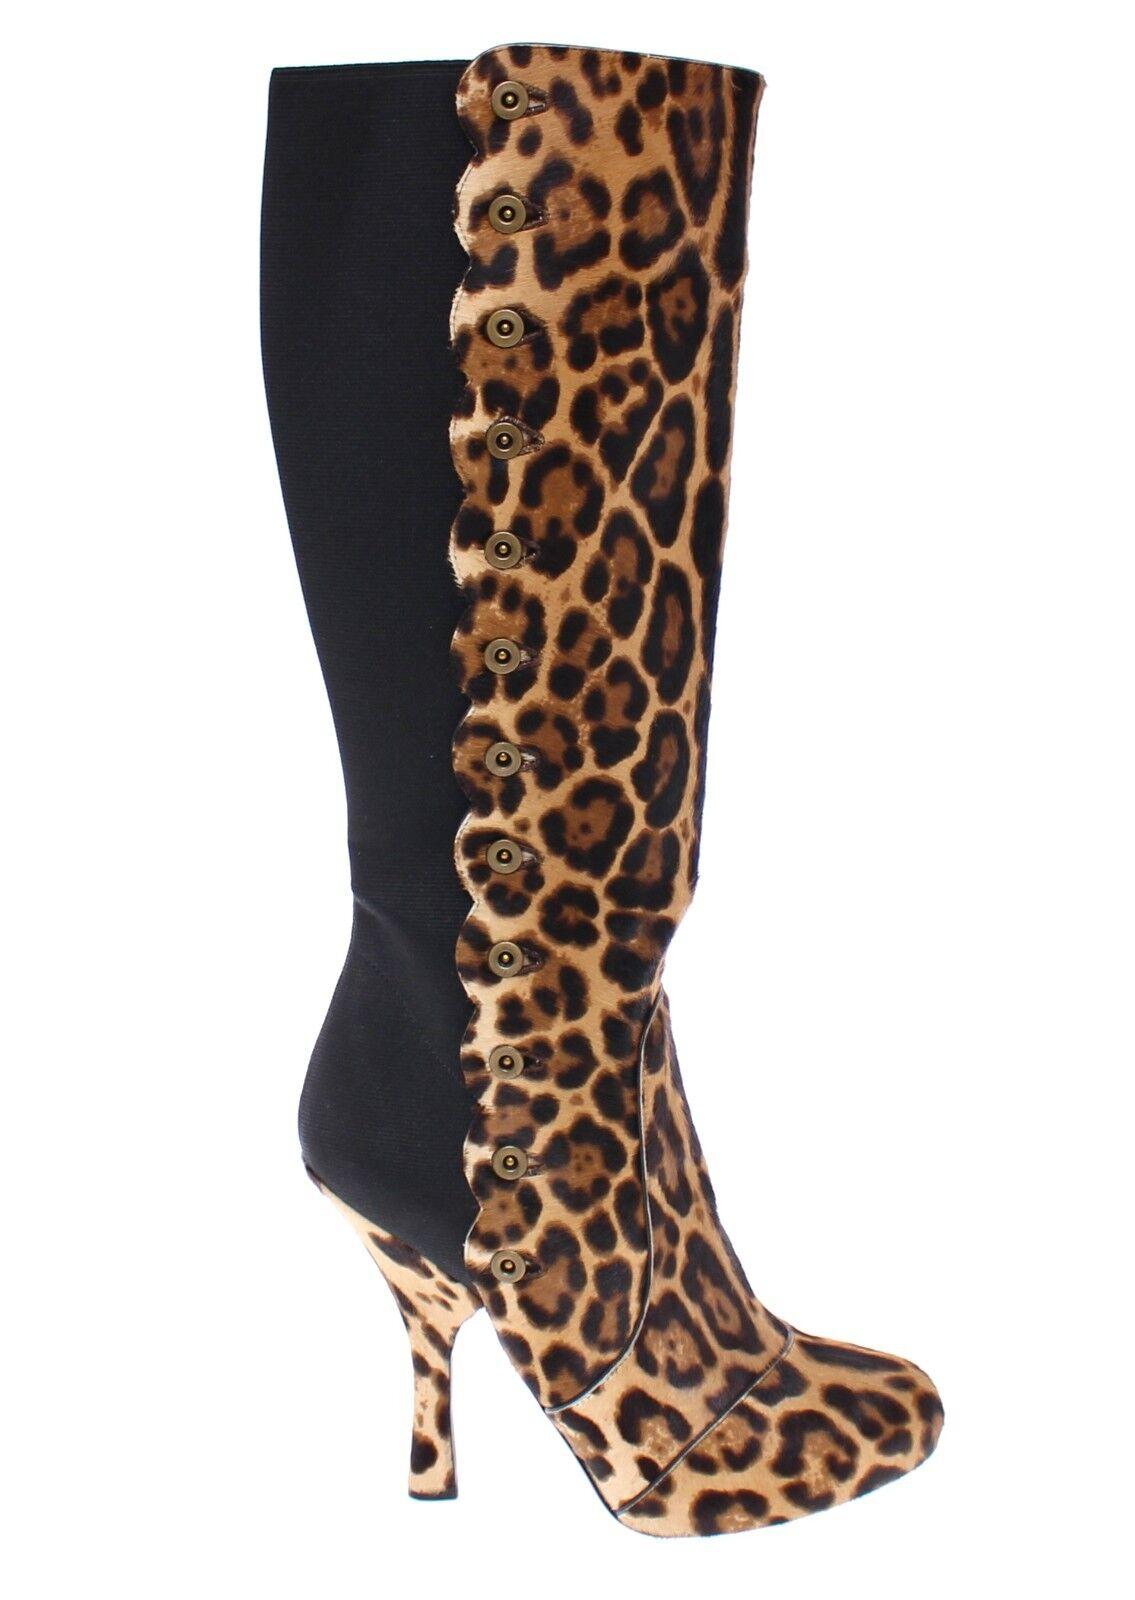 NWT 2600 DOLCE & GABBANA Braun Leopard Leopard Leopard Fur Leder Heel Logo Stiefel EU40 / US9.5 6b1394